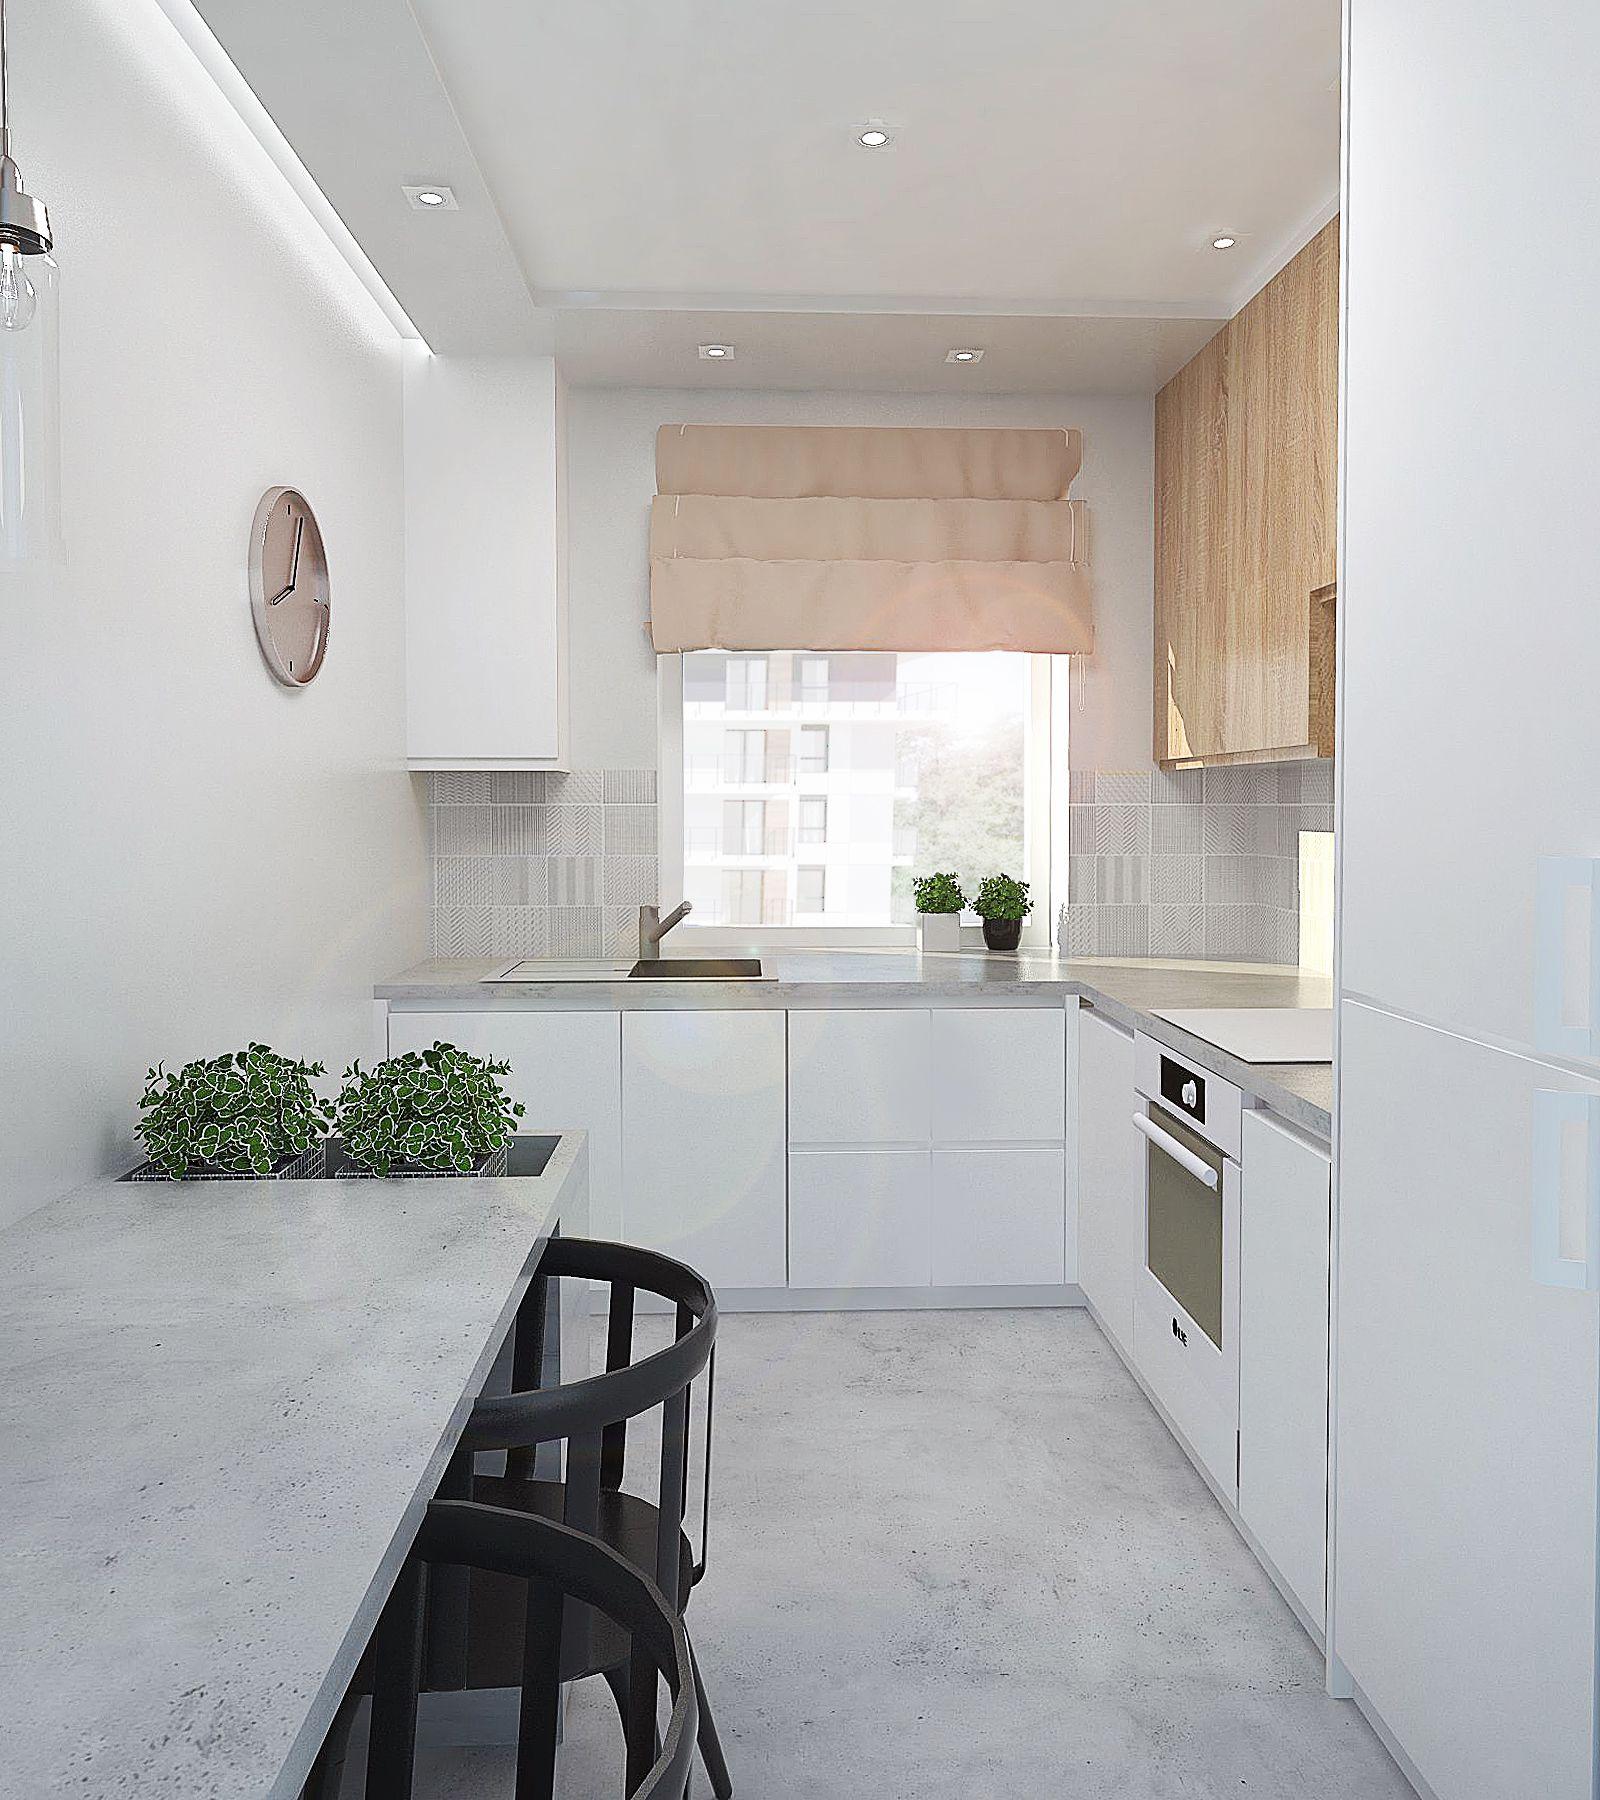 Kuchnia Na Wymiar Kuchnia Biala Kuchnia Biala Z Drewnem Skandynawski Styl Beton W Kuchni Kitchen Interior Home Decor Interior